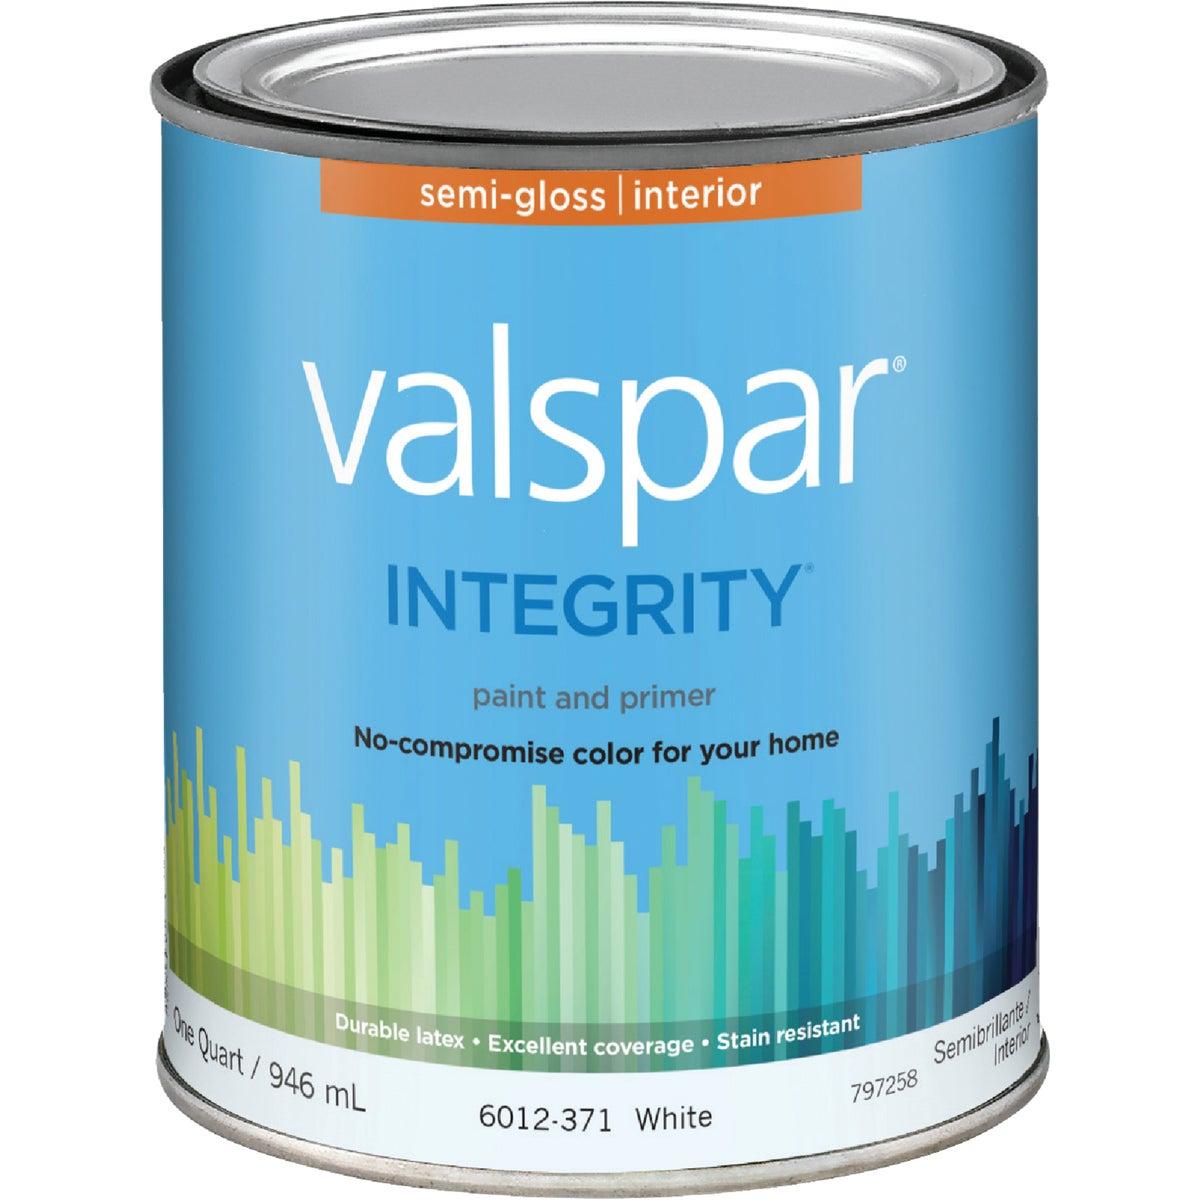 INT S/G WHITE PAINT - 004.6012371.005 by Valspar Corp